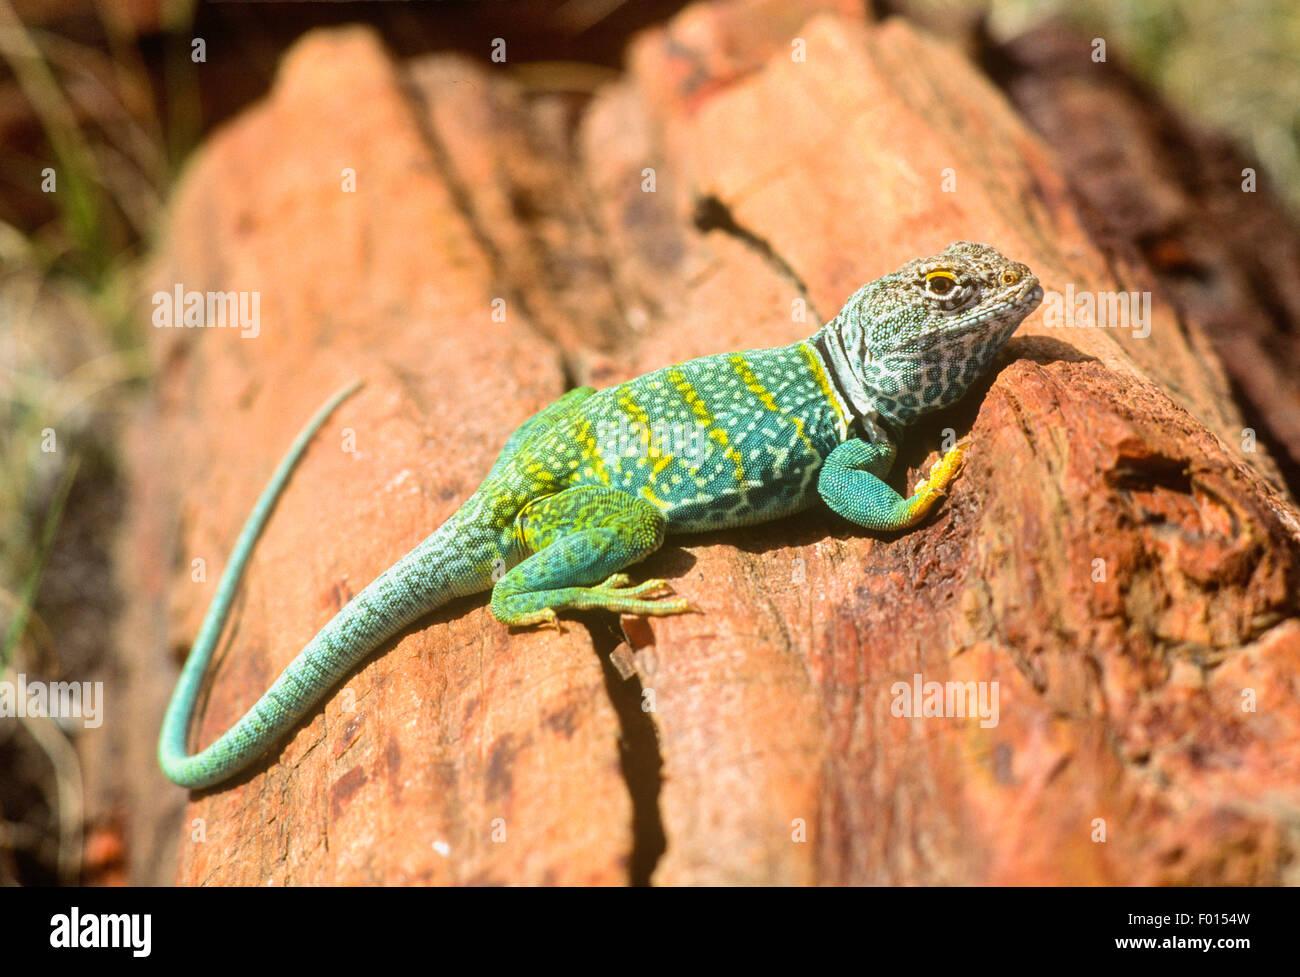 collared lizard, Petrified Forest National Park, Arizona - Stock Image